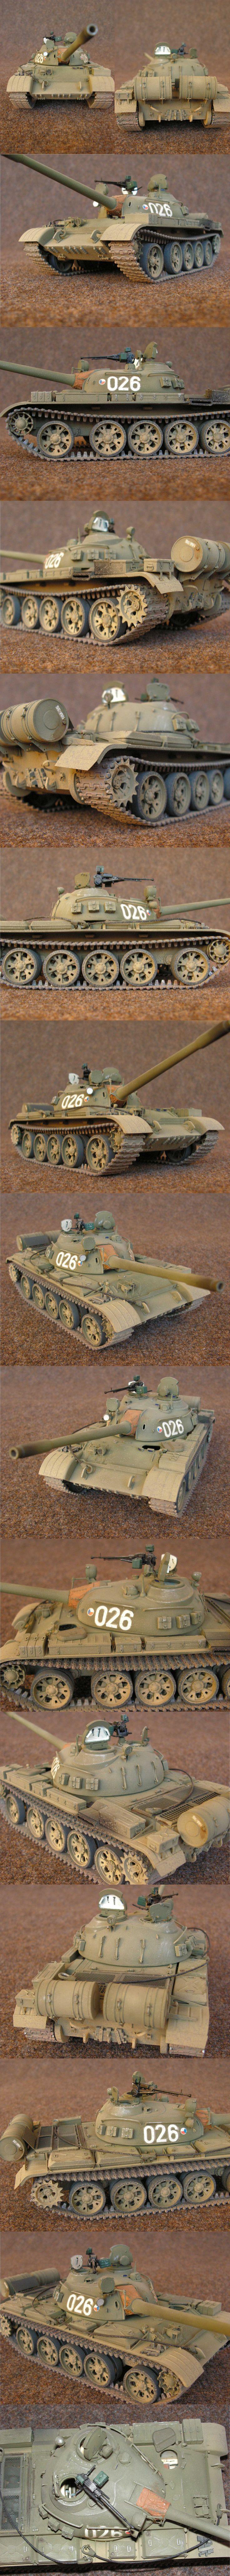 T-55 A ČSLA SKIF